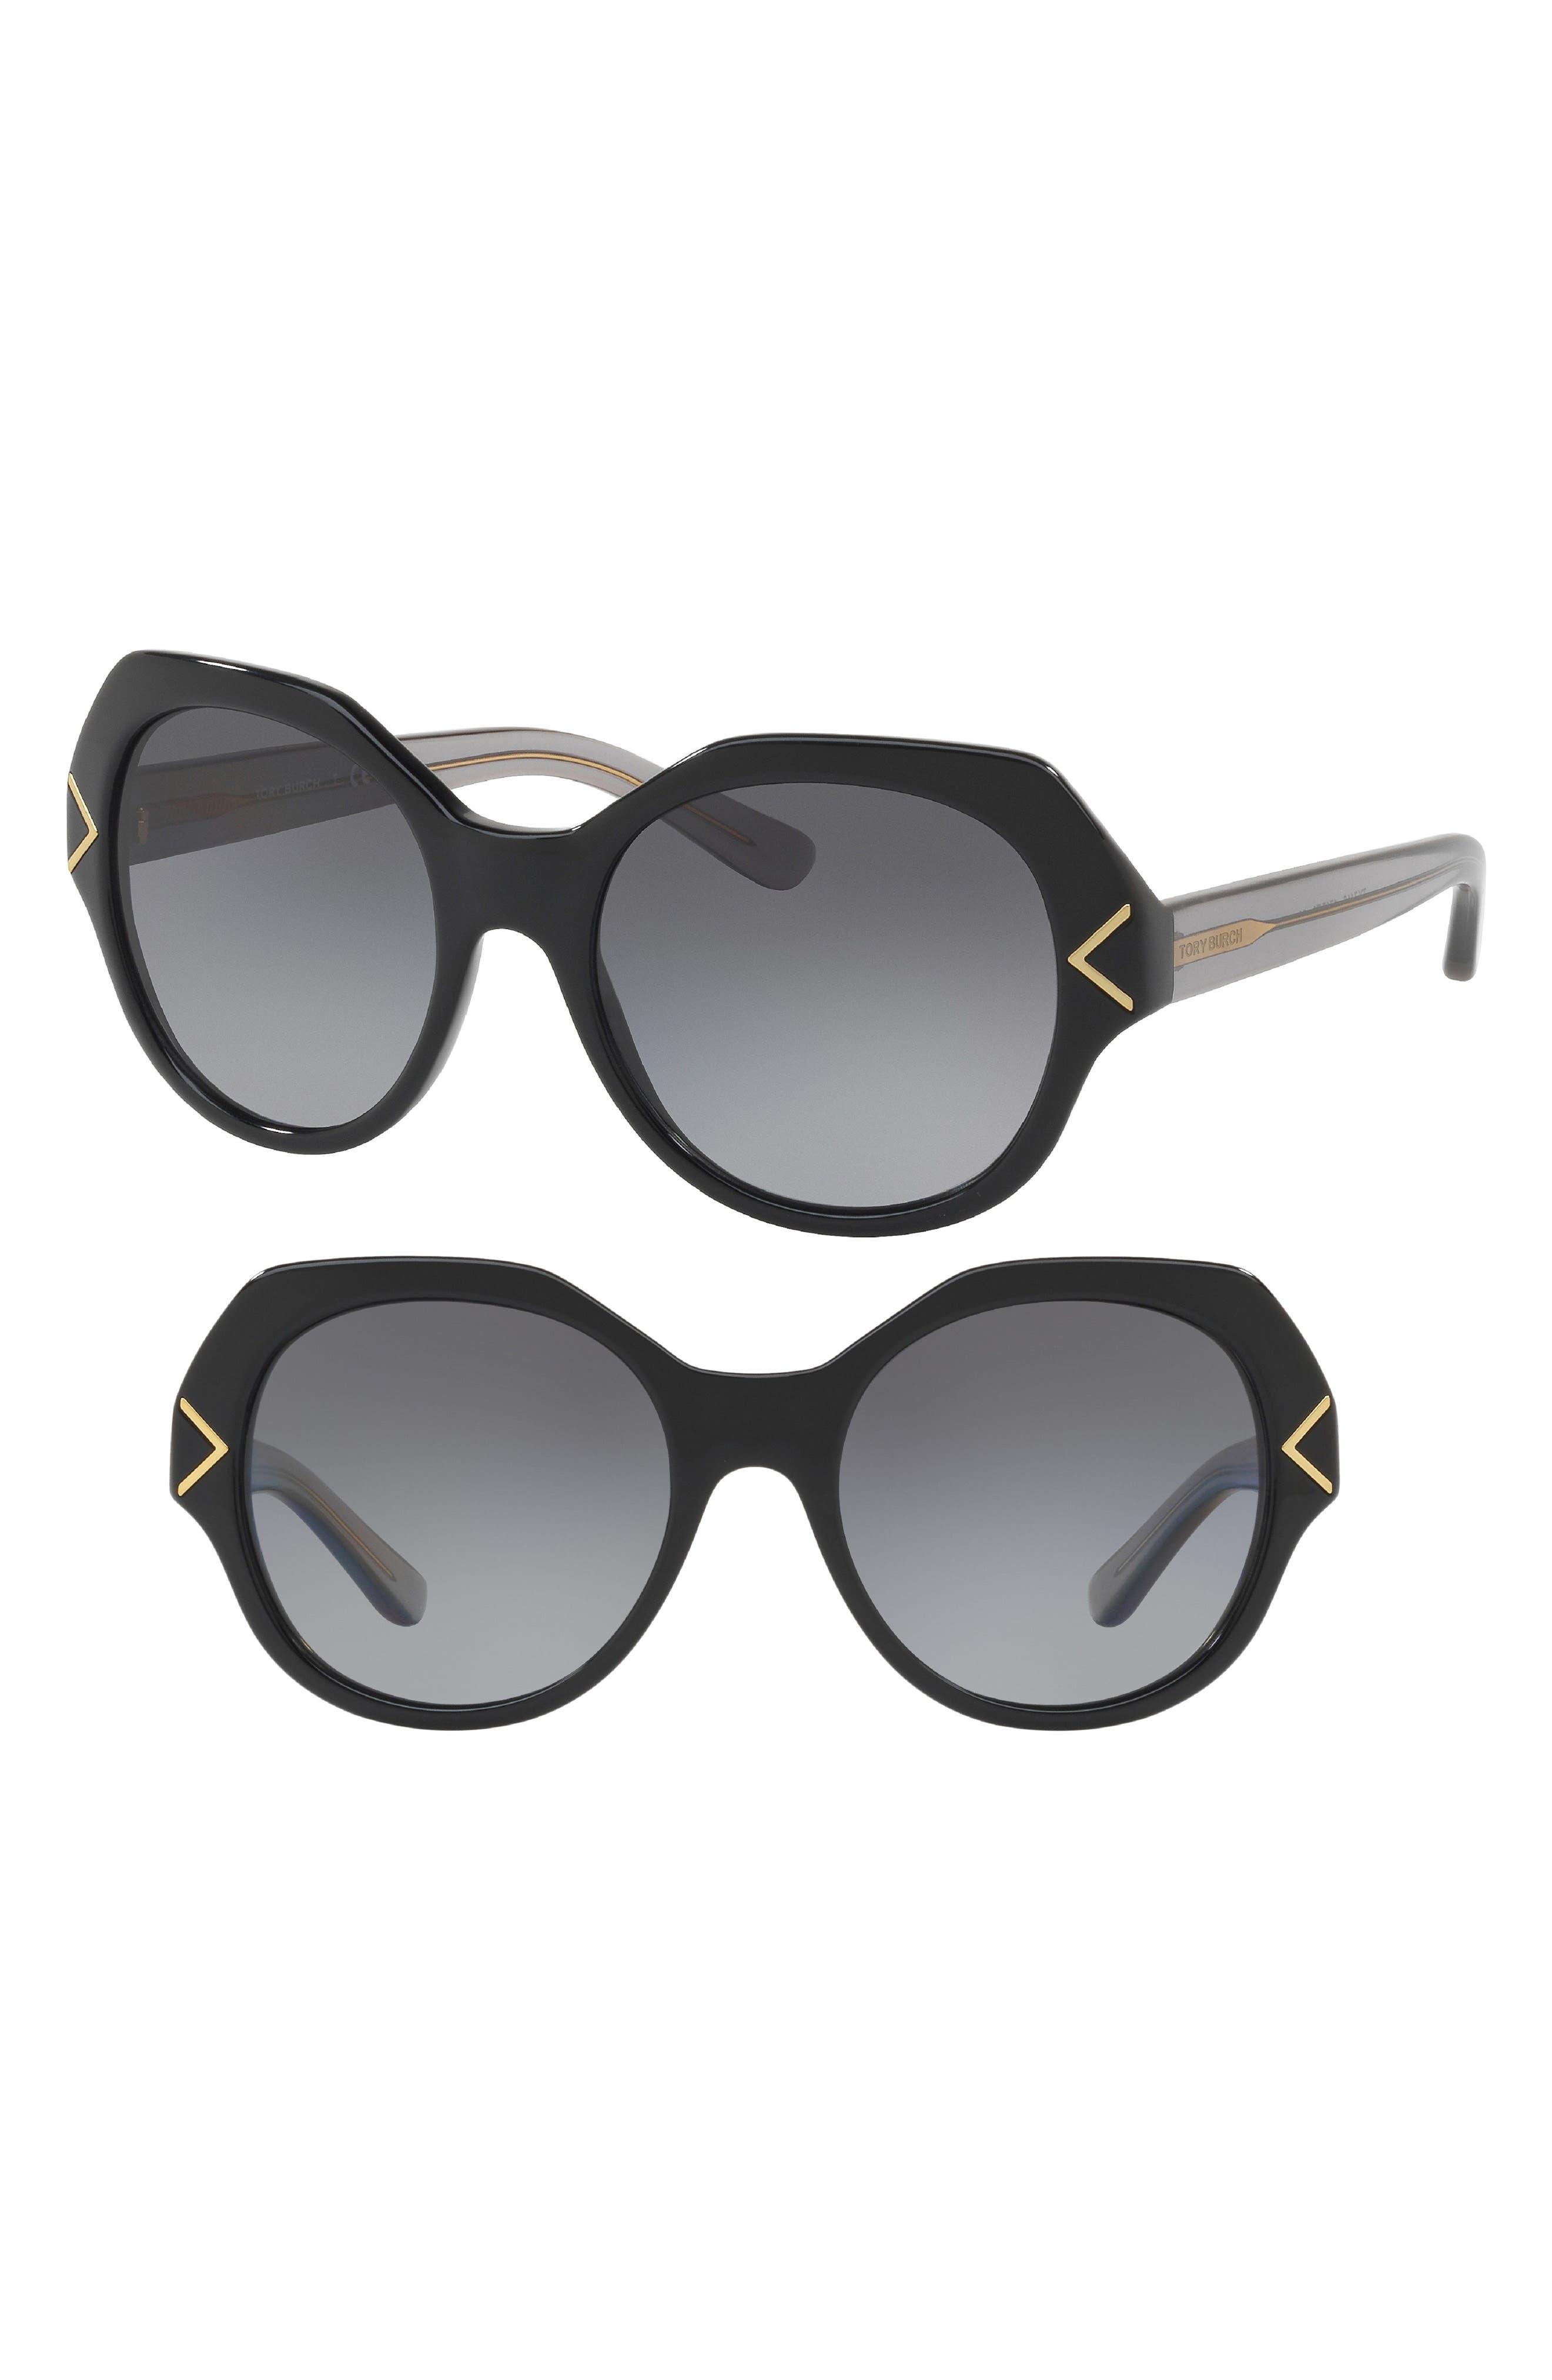 Main Image - Tory Burch 53mm Polarized Gradient Geometric Sunglasses